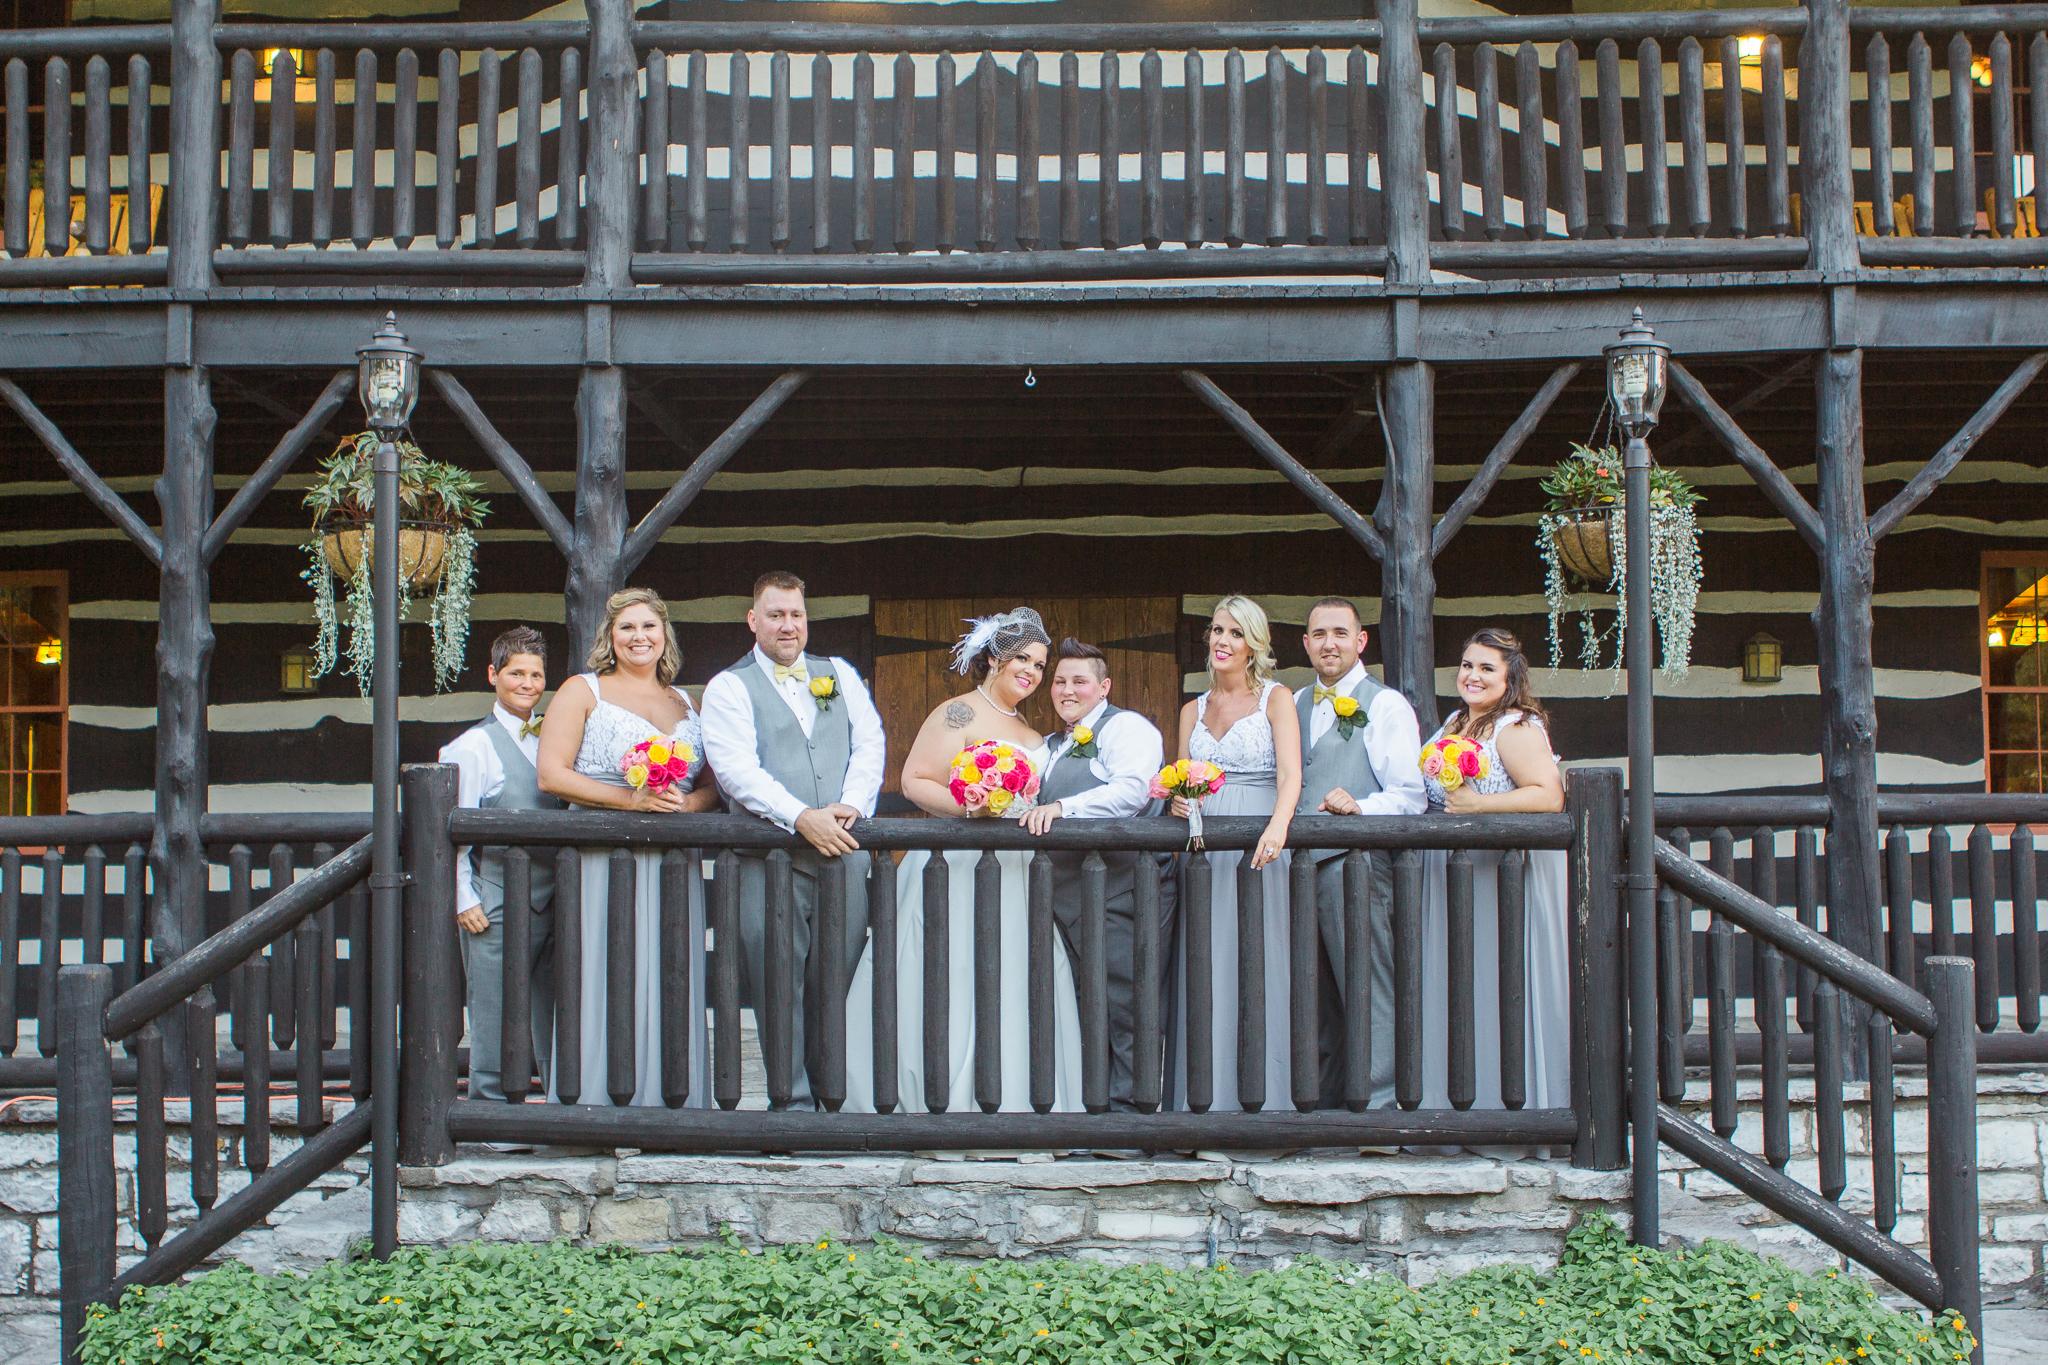 Richmond Kentucky Wedding Photographer - Ariana Jordan Photography -22-2.jpg